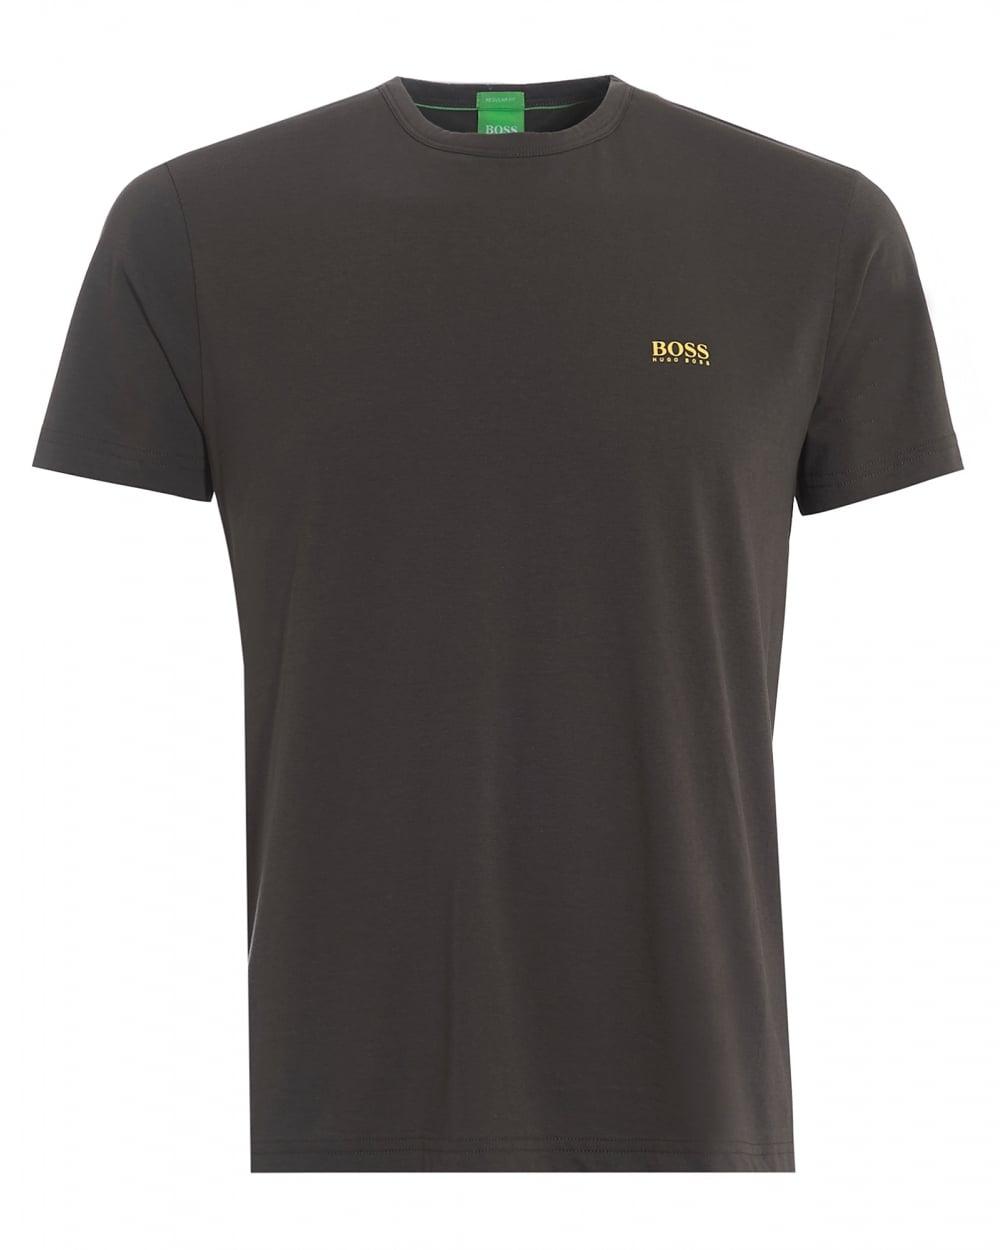 Hugo boss green mens tee plain basic raven grey t shirt for Boss mens t shirts